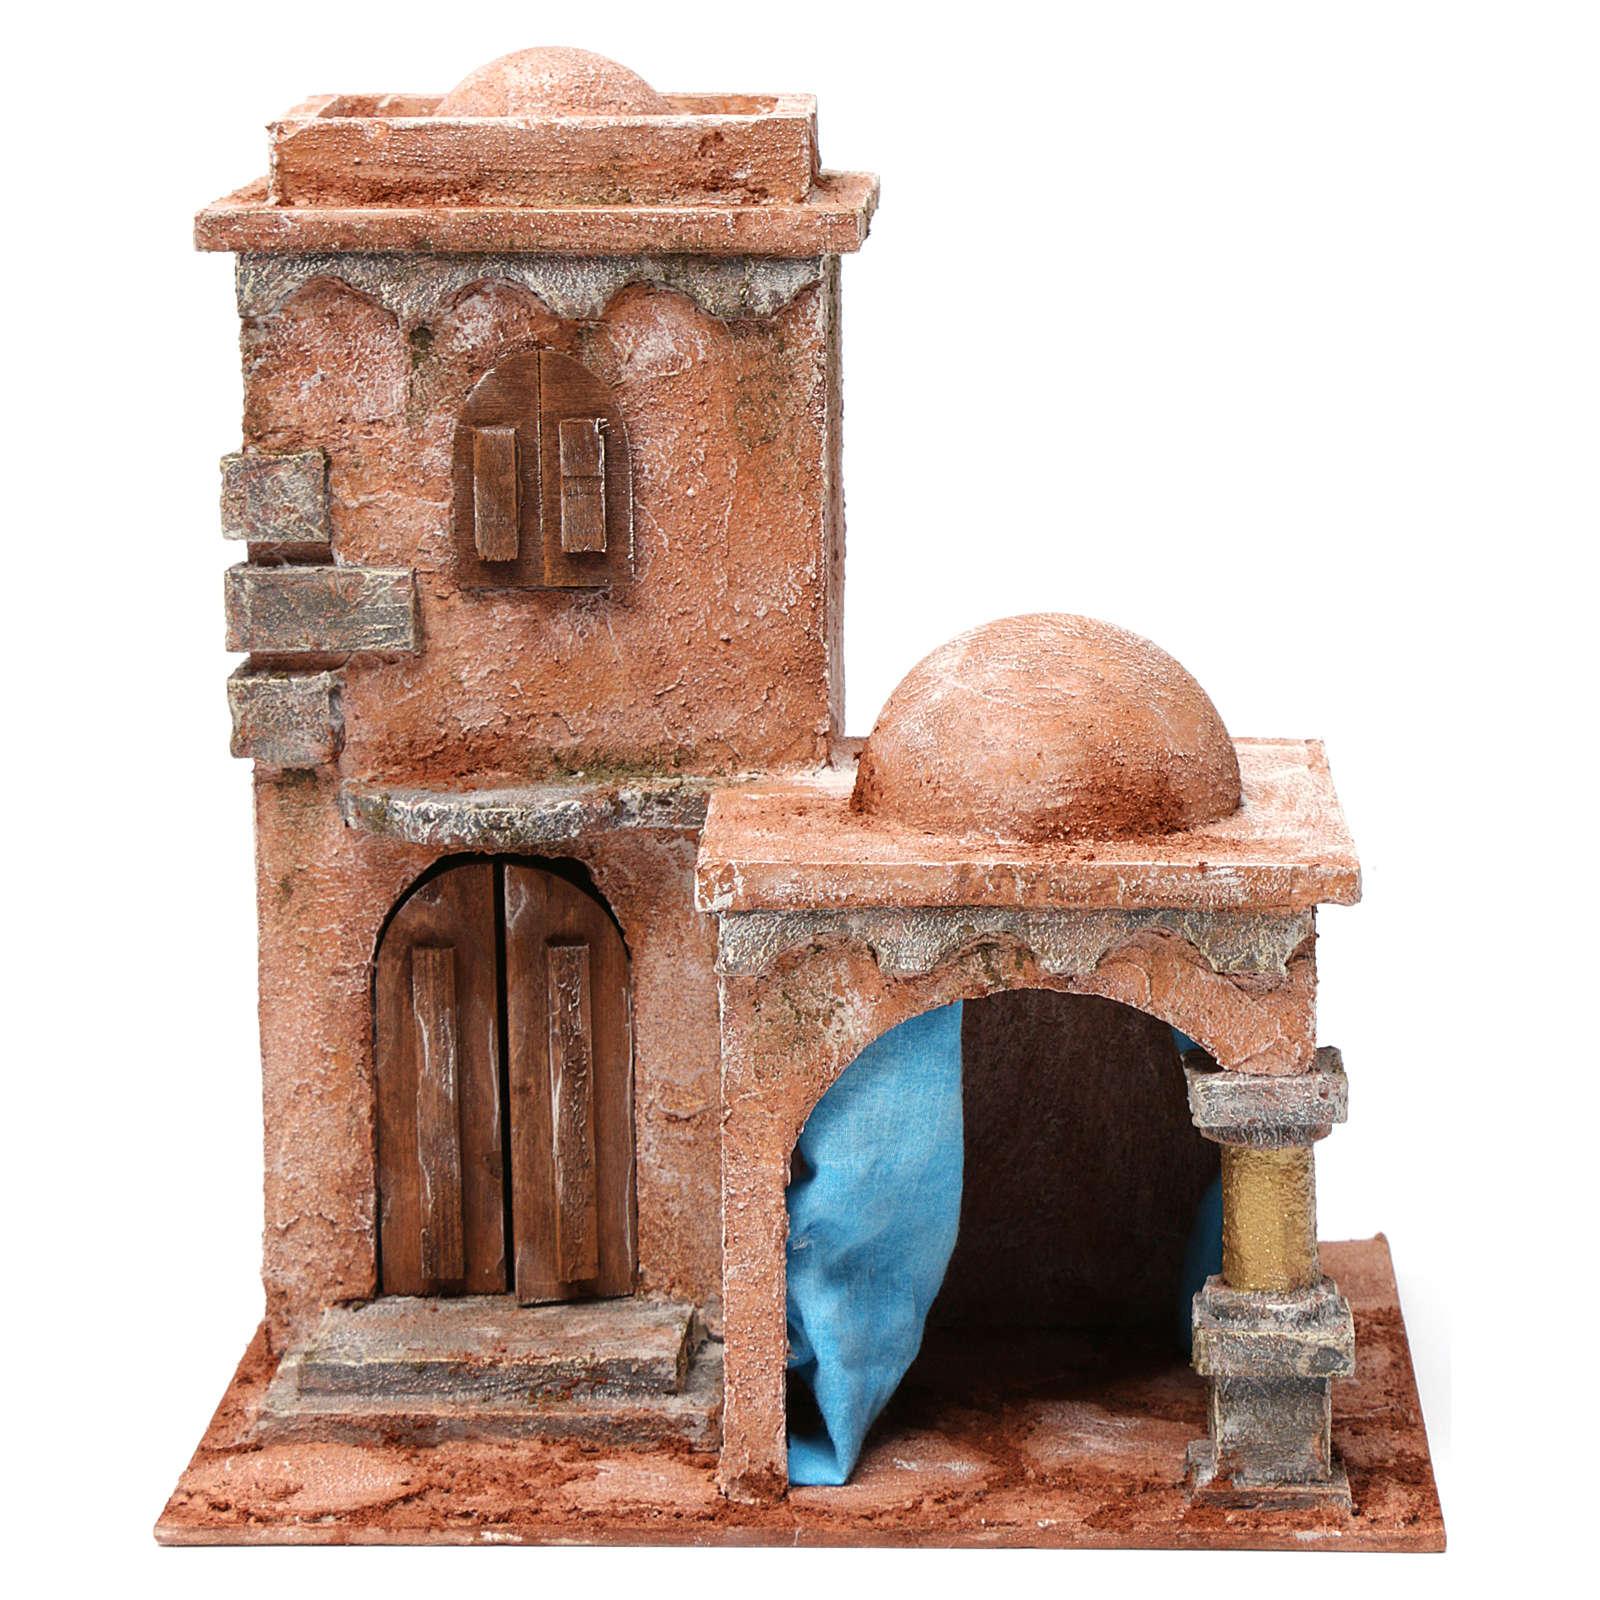 Casa araba con doppia cupola e tenda azzurra per presepe 10 cm 30X20X20 4